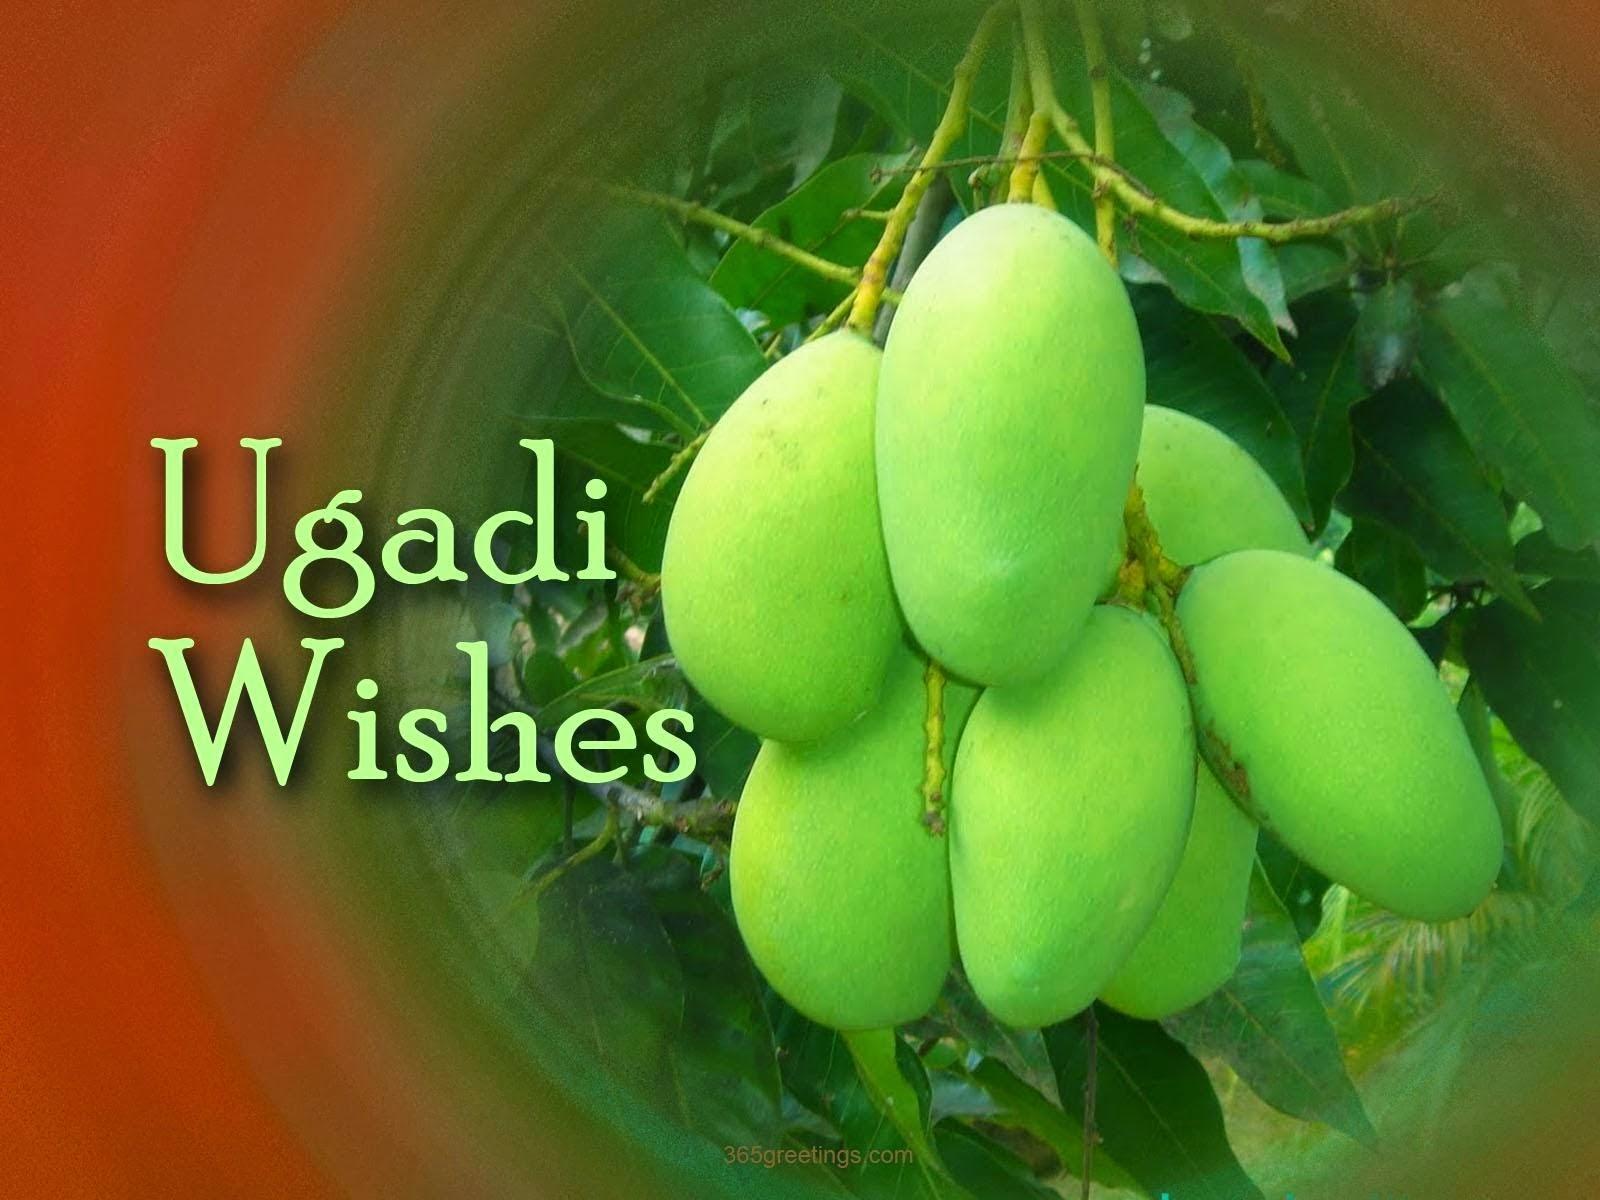 Happy Ugadi, Telugu New Year Wishes HD Wallpapers - HD Wallpaper ...